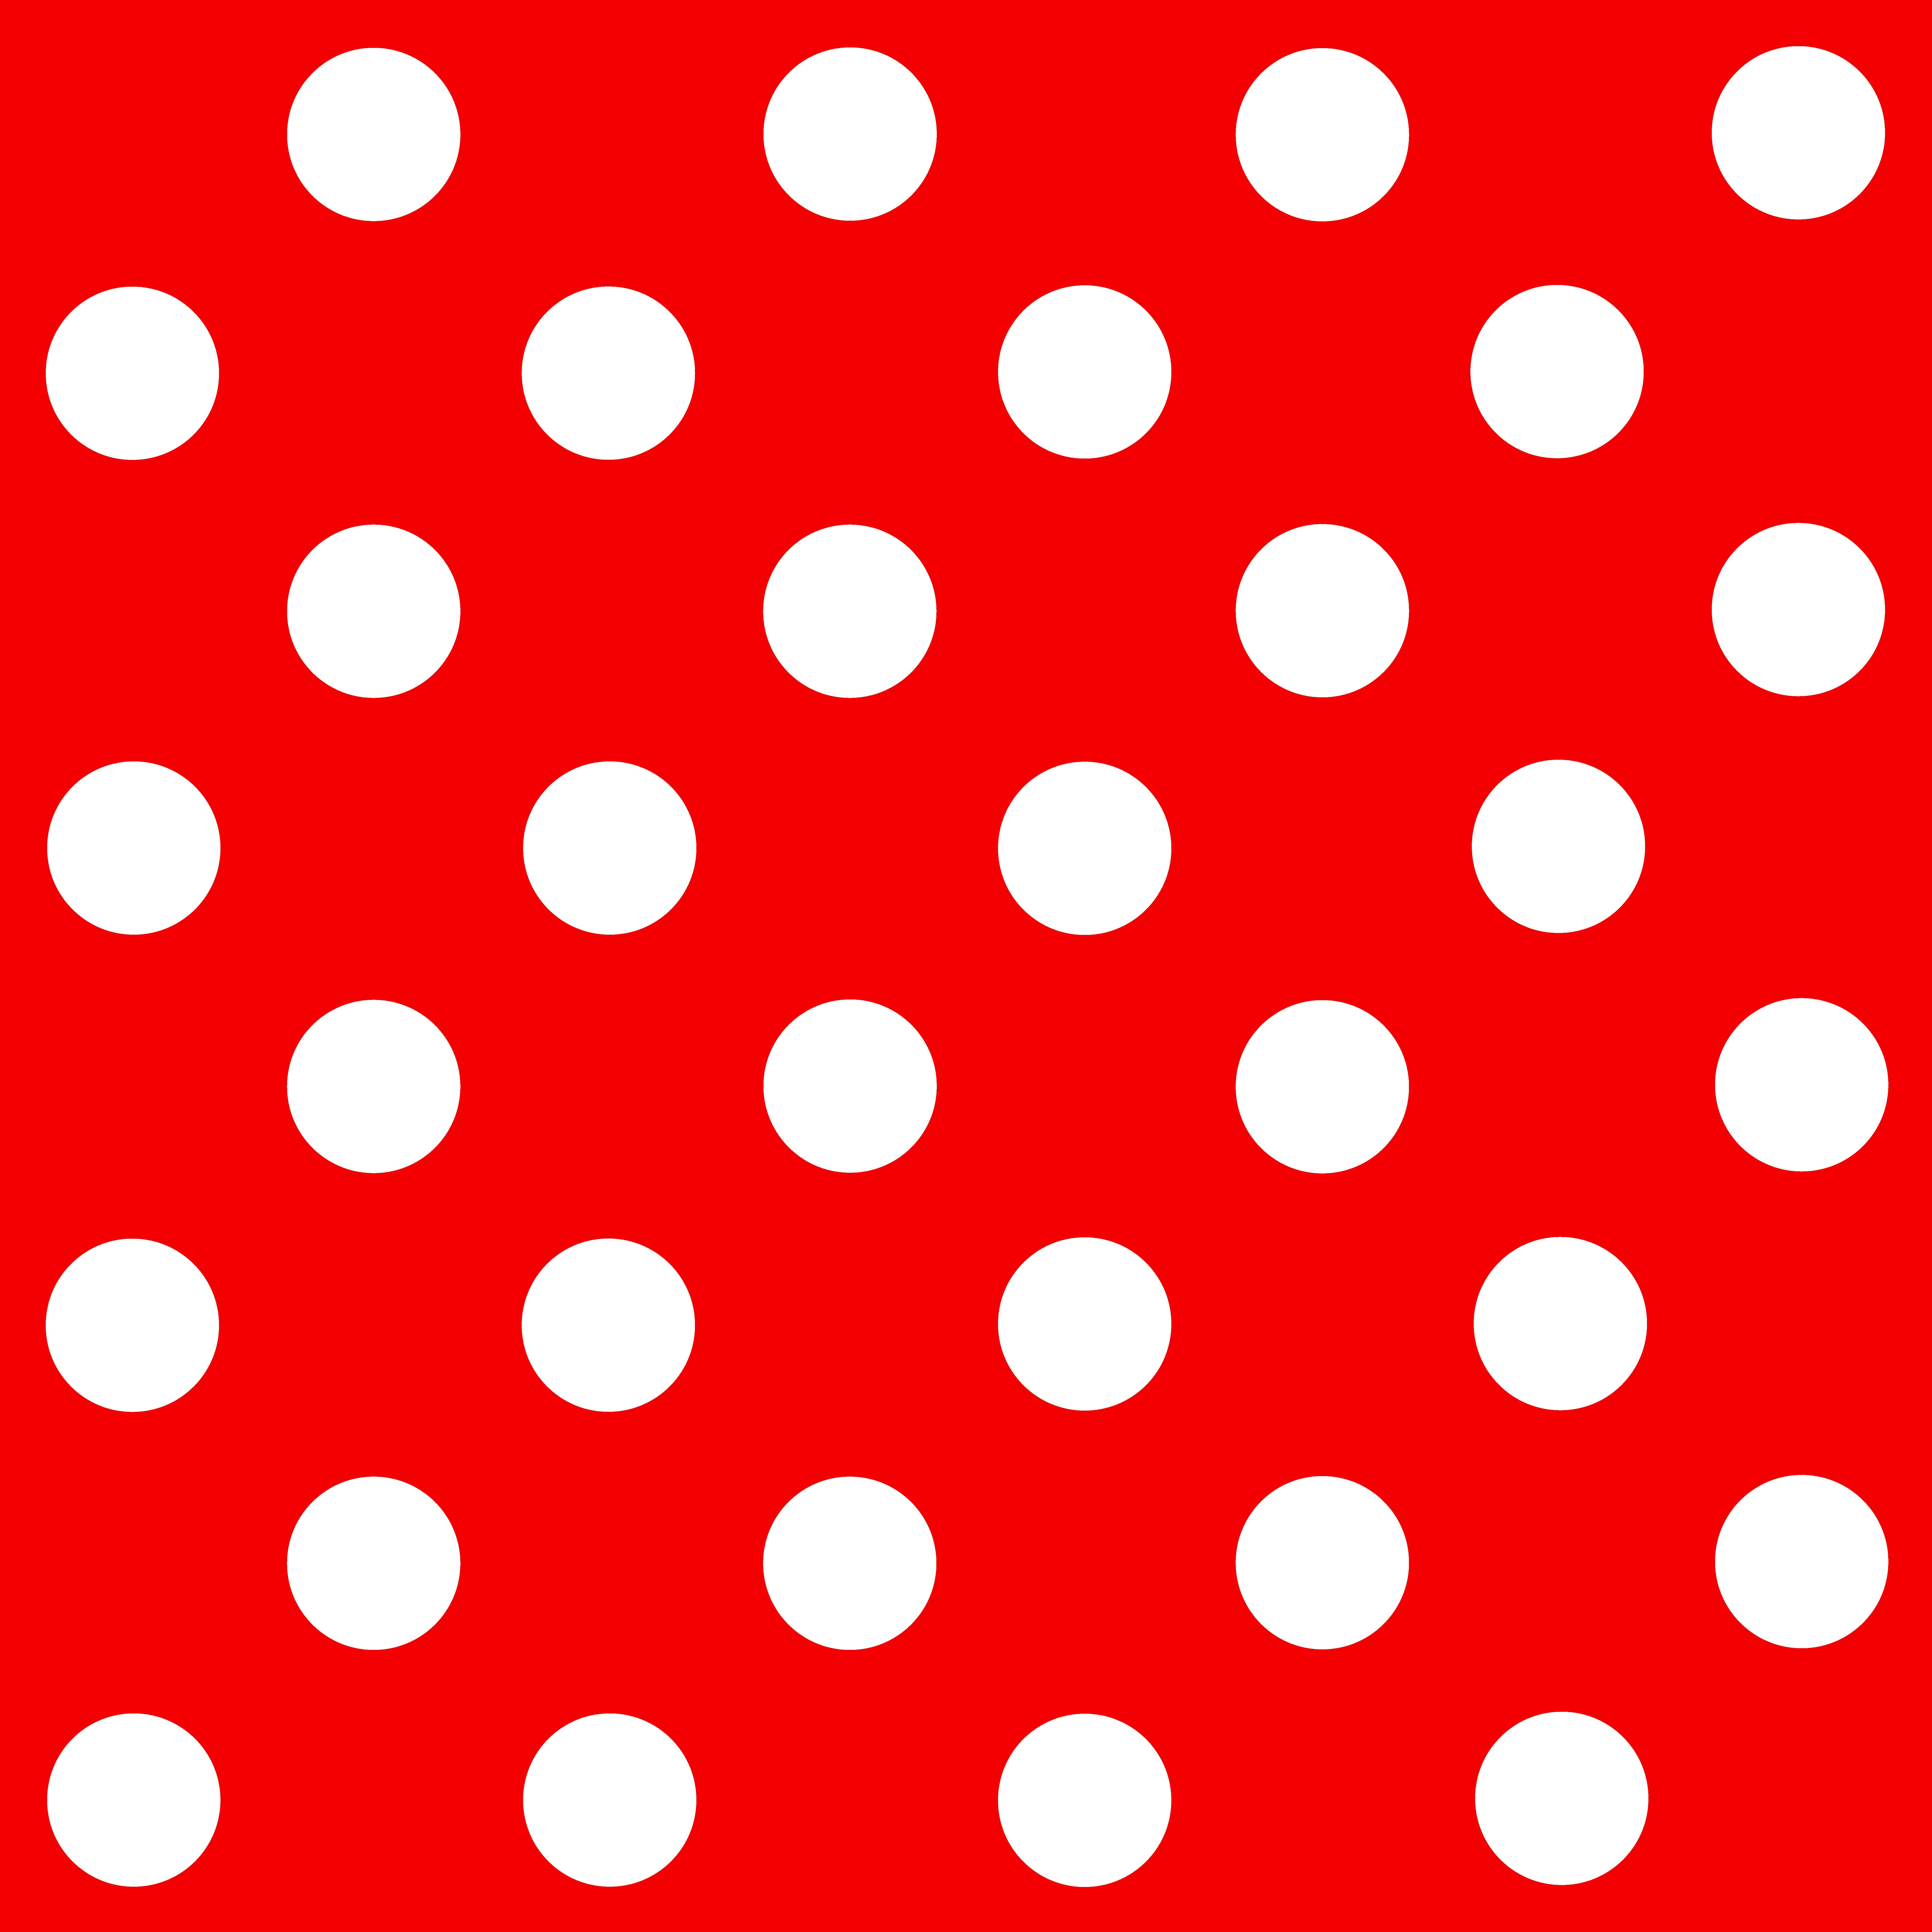 White Polka Dot Wallpaper Wallpapersafari